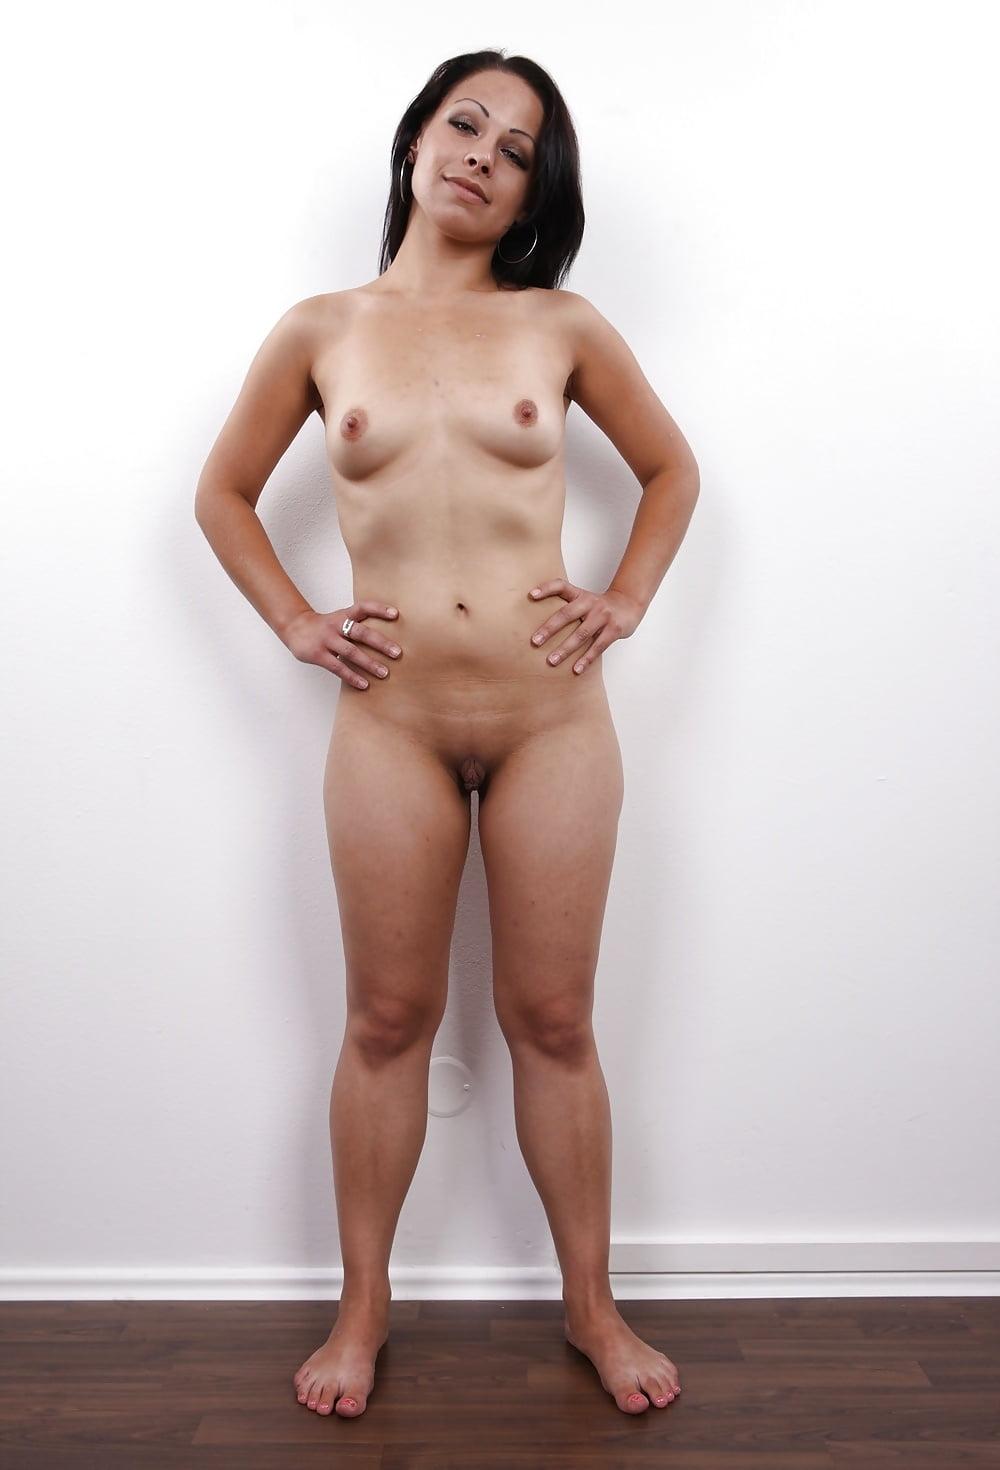 Porn tube 2020 Hot thick girls in bikinis